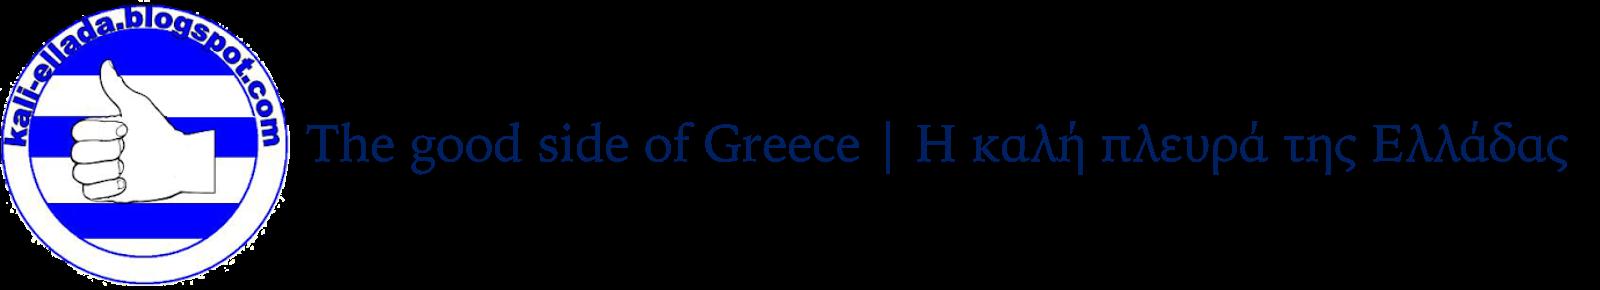 The good side of Greece | Η καλή πλευρά της Ελλάδας